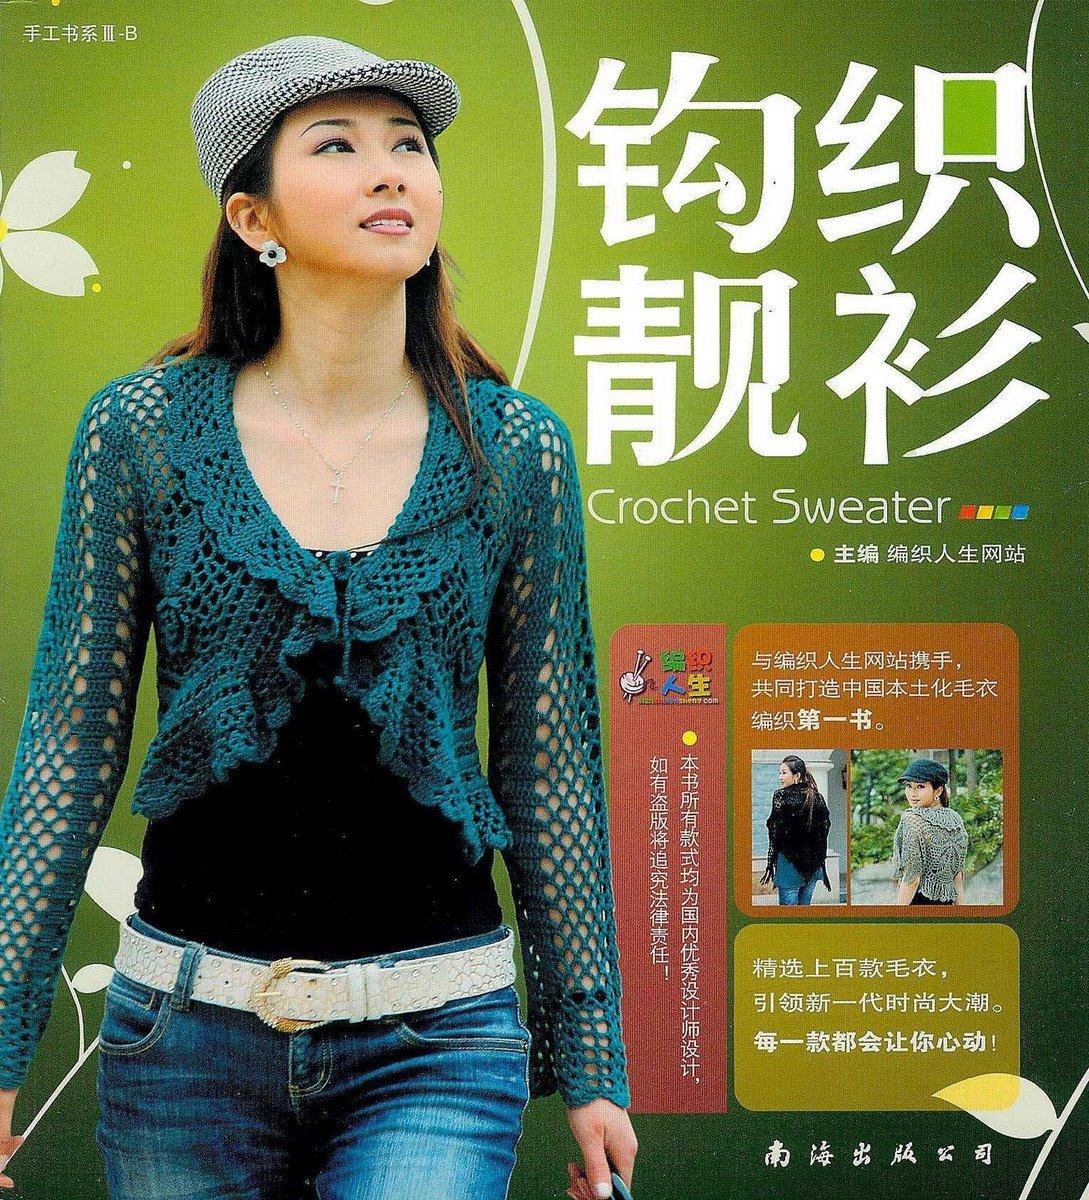 BIANZHI - китайский сборник по вязанию - САМОБРАНОЧКА 63